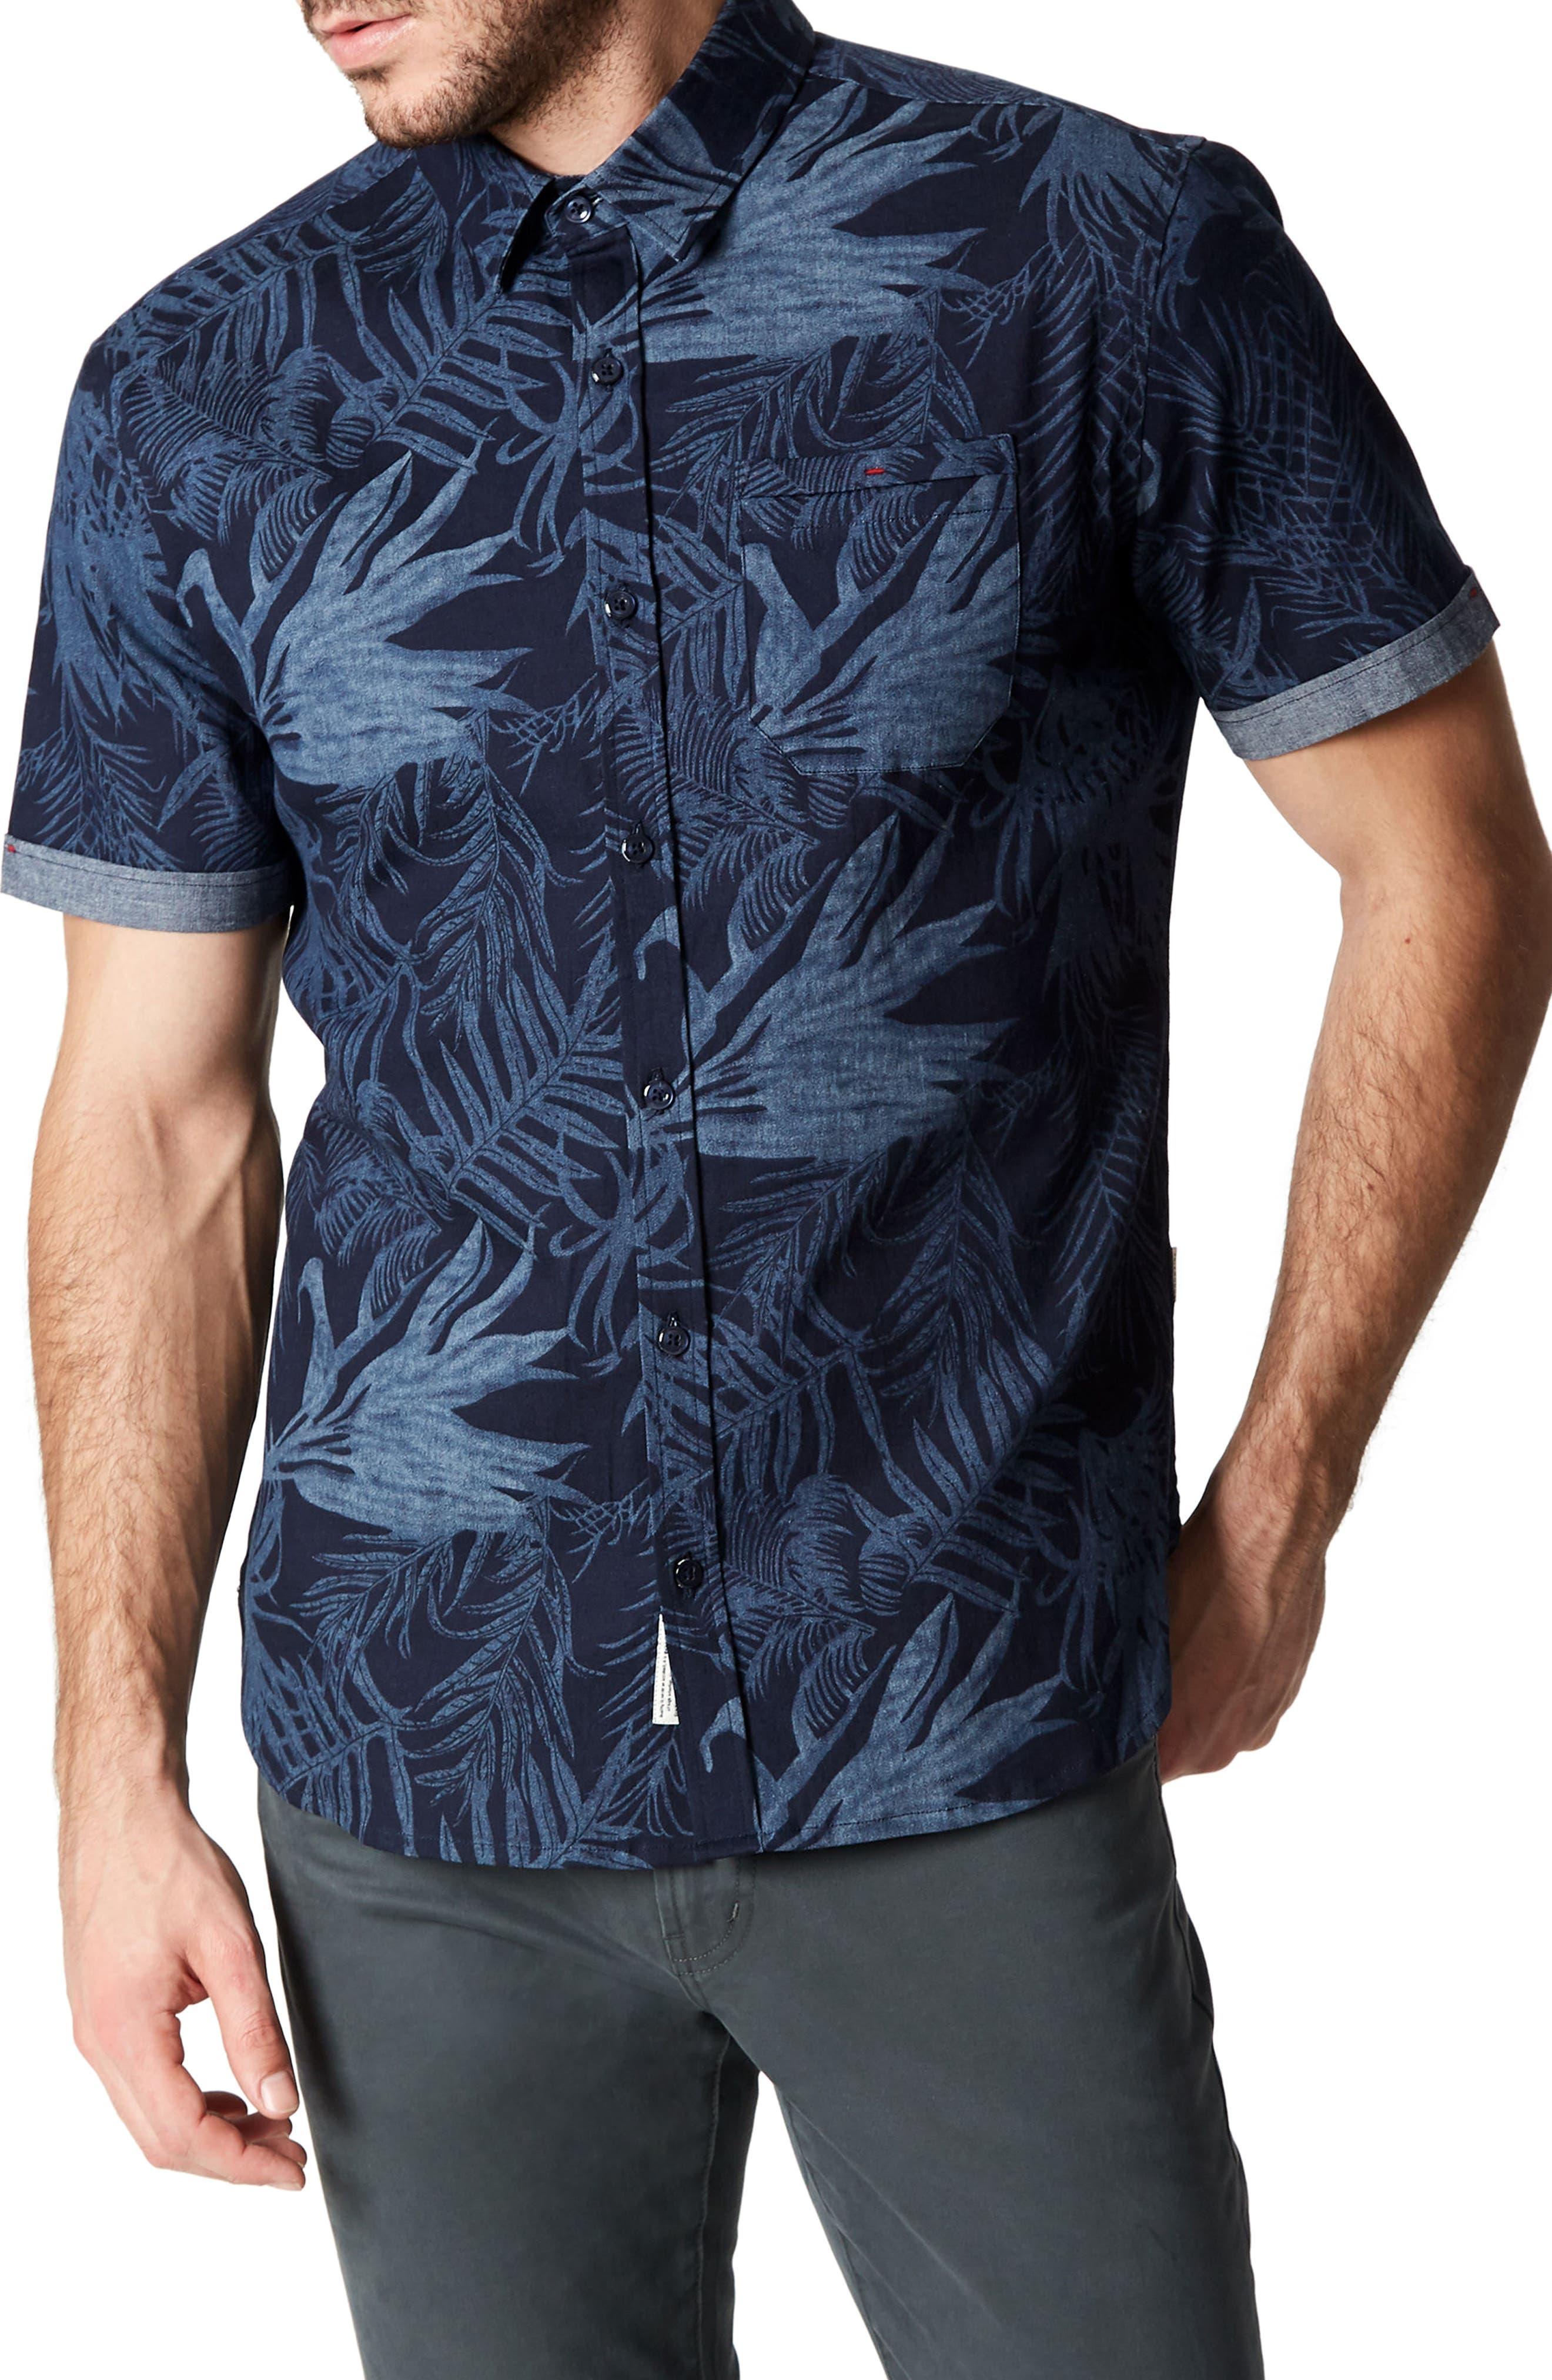 Feeling Good Woven Shirt,                         Main,                         color, NAVY